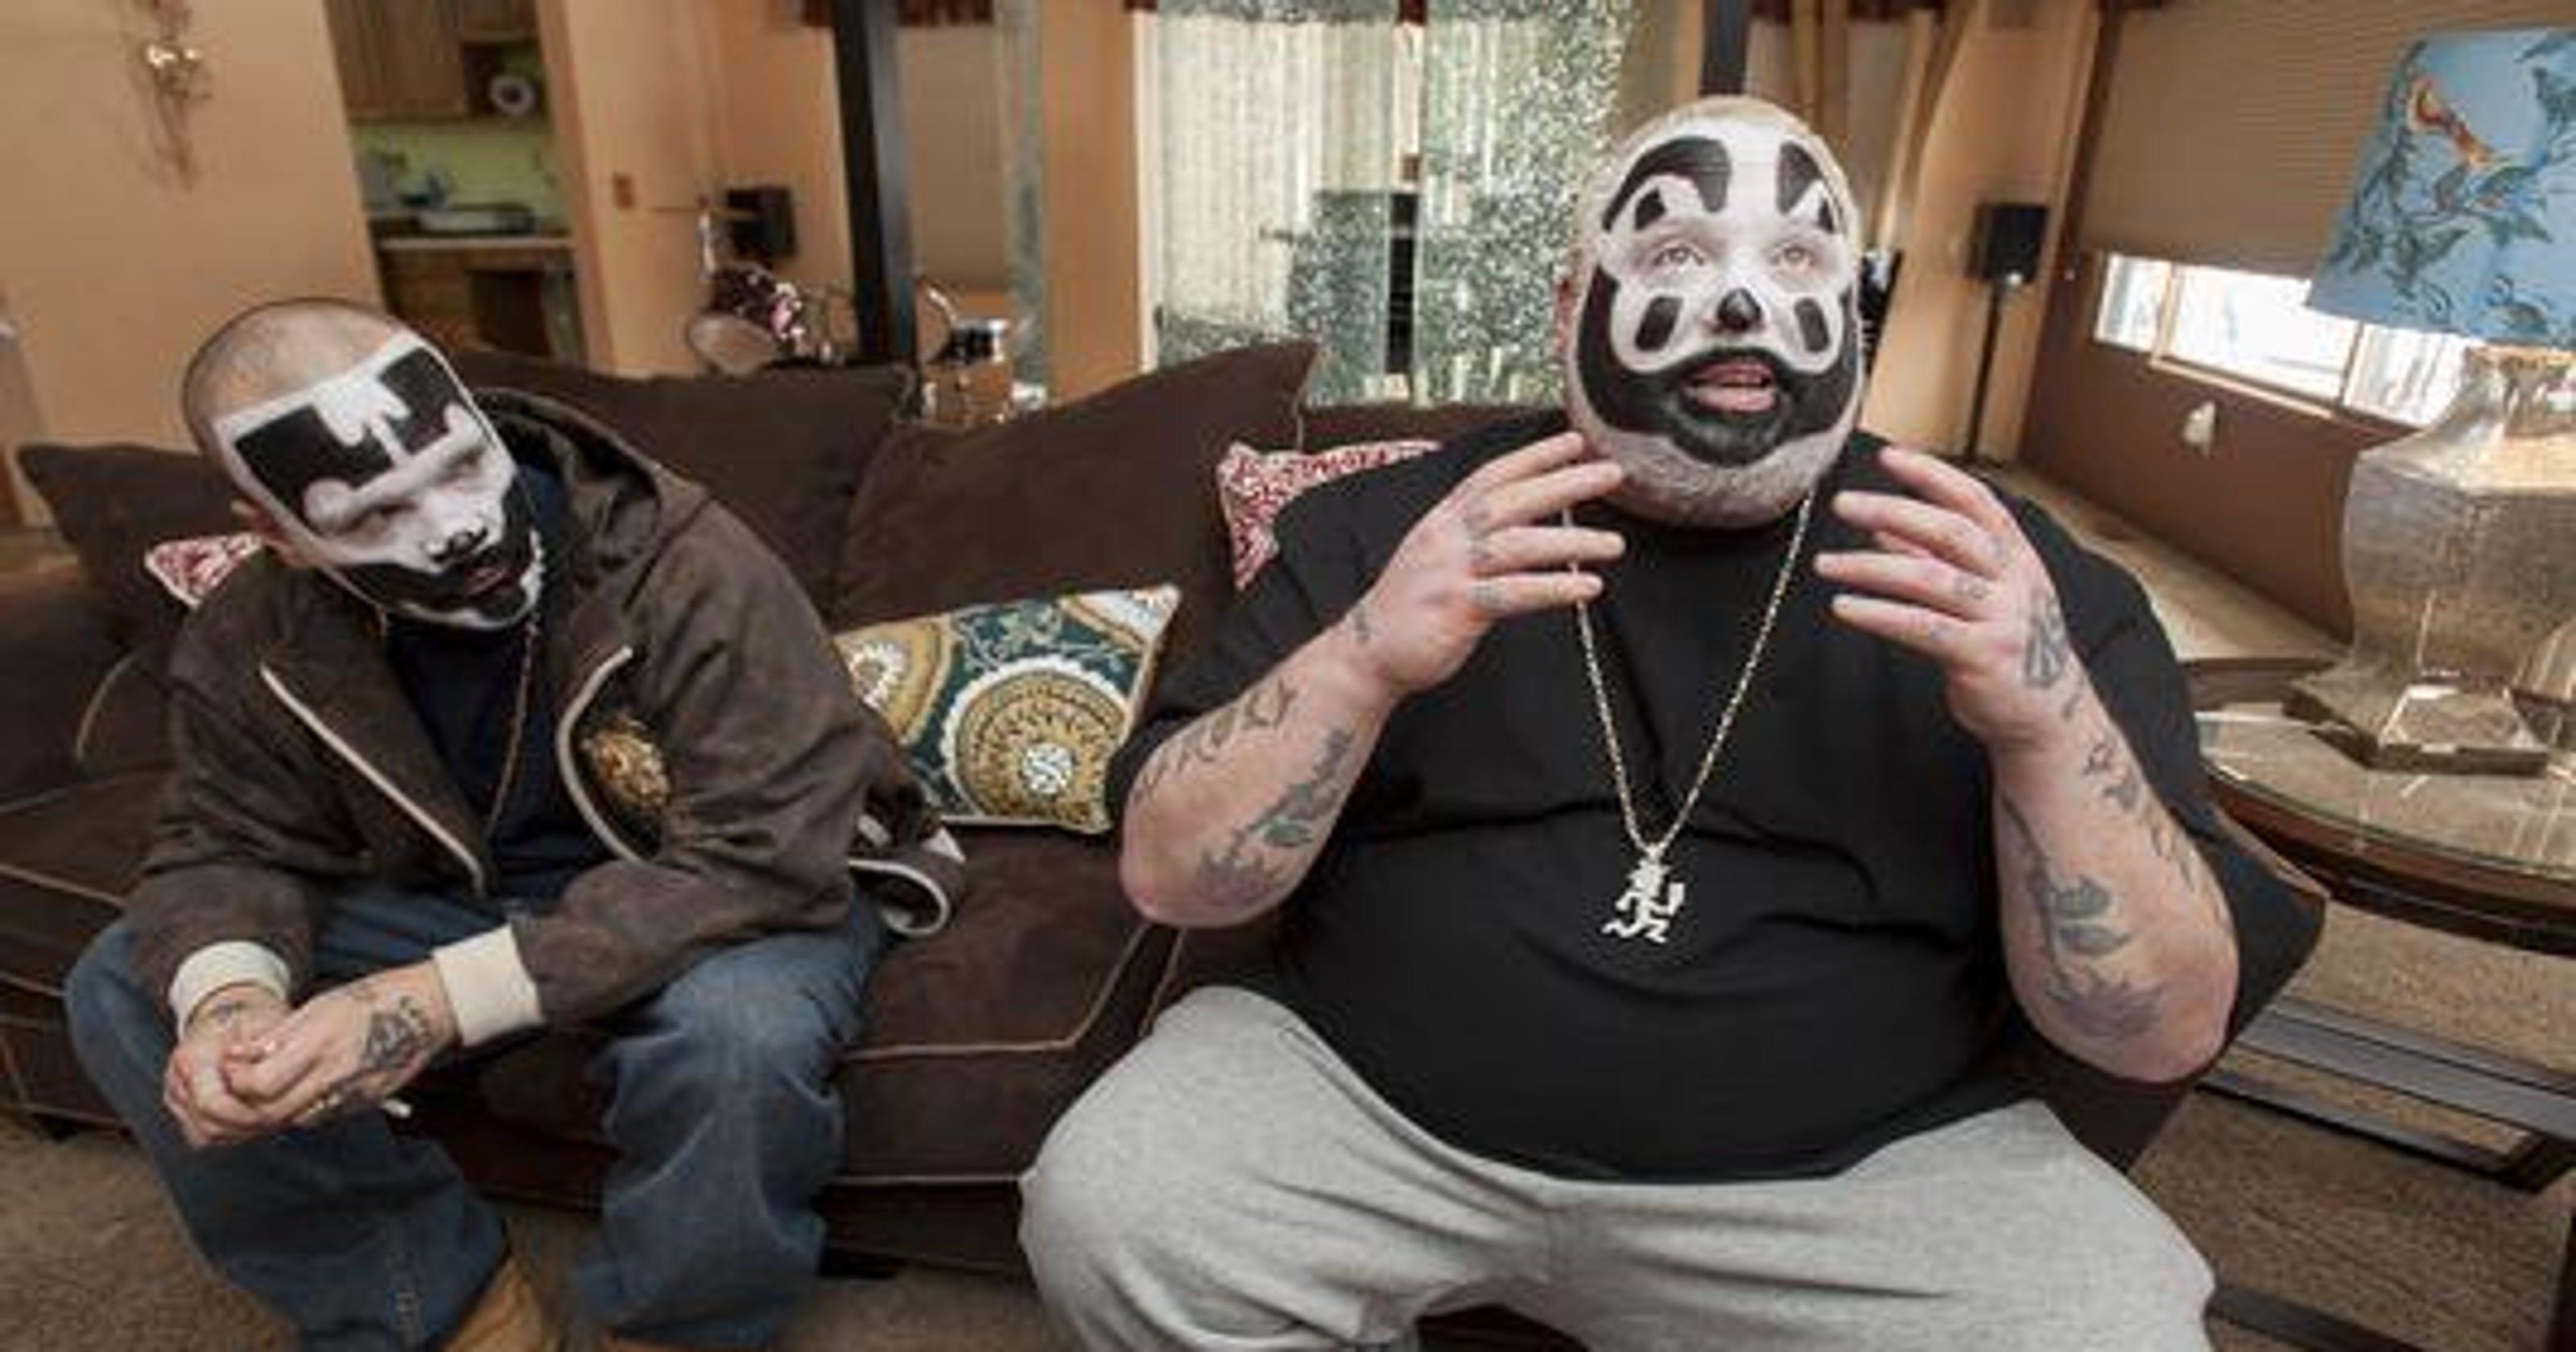 Court reinstates Insane Clown Posse suit against FBI